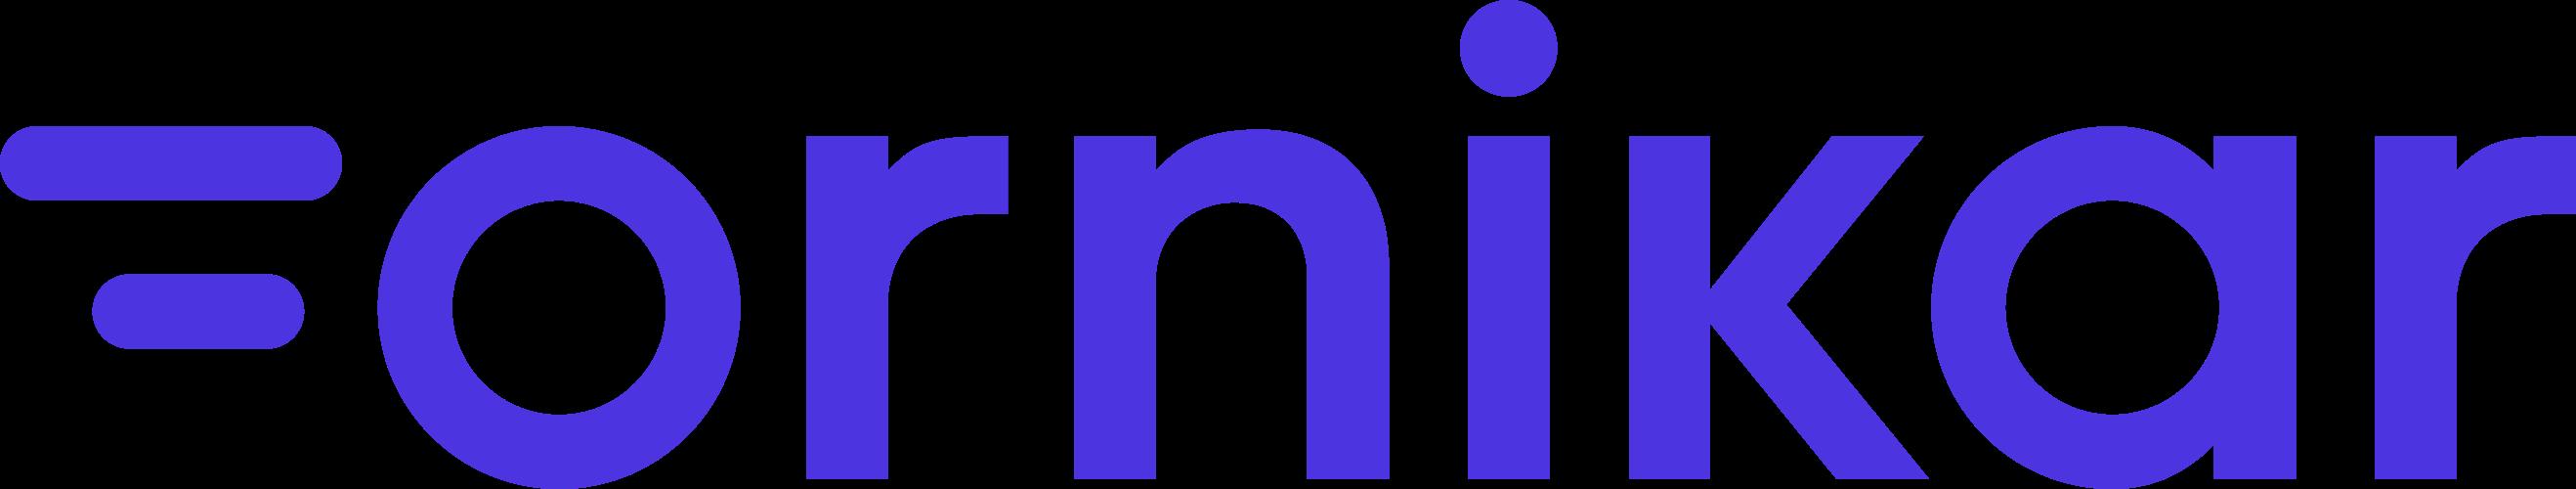 Ornikar_purple (2)